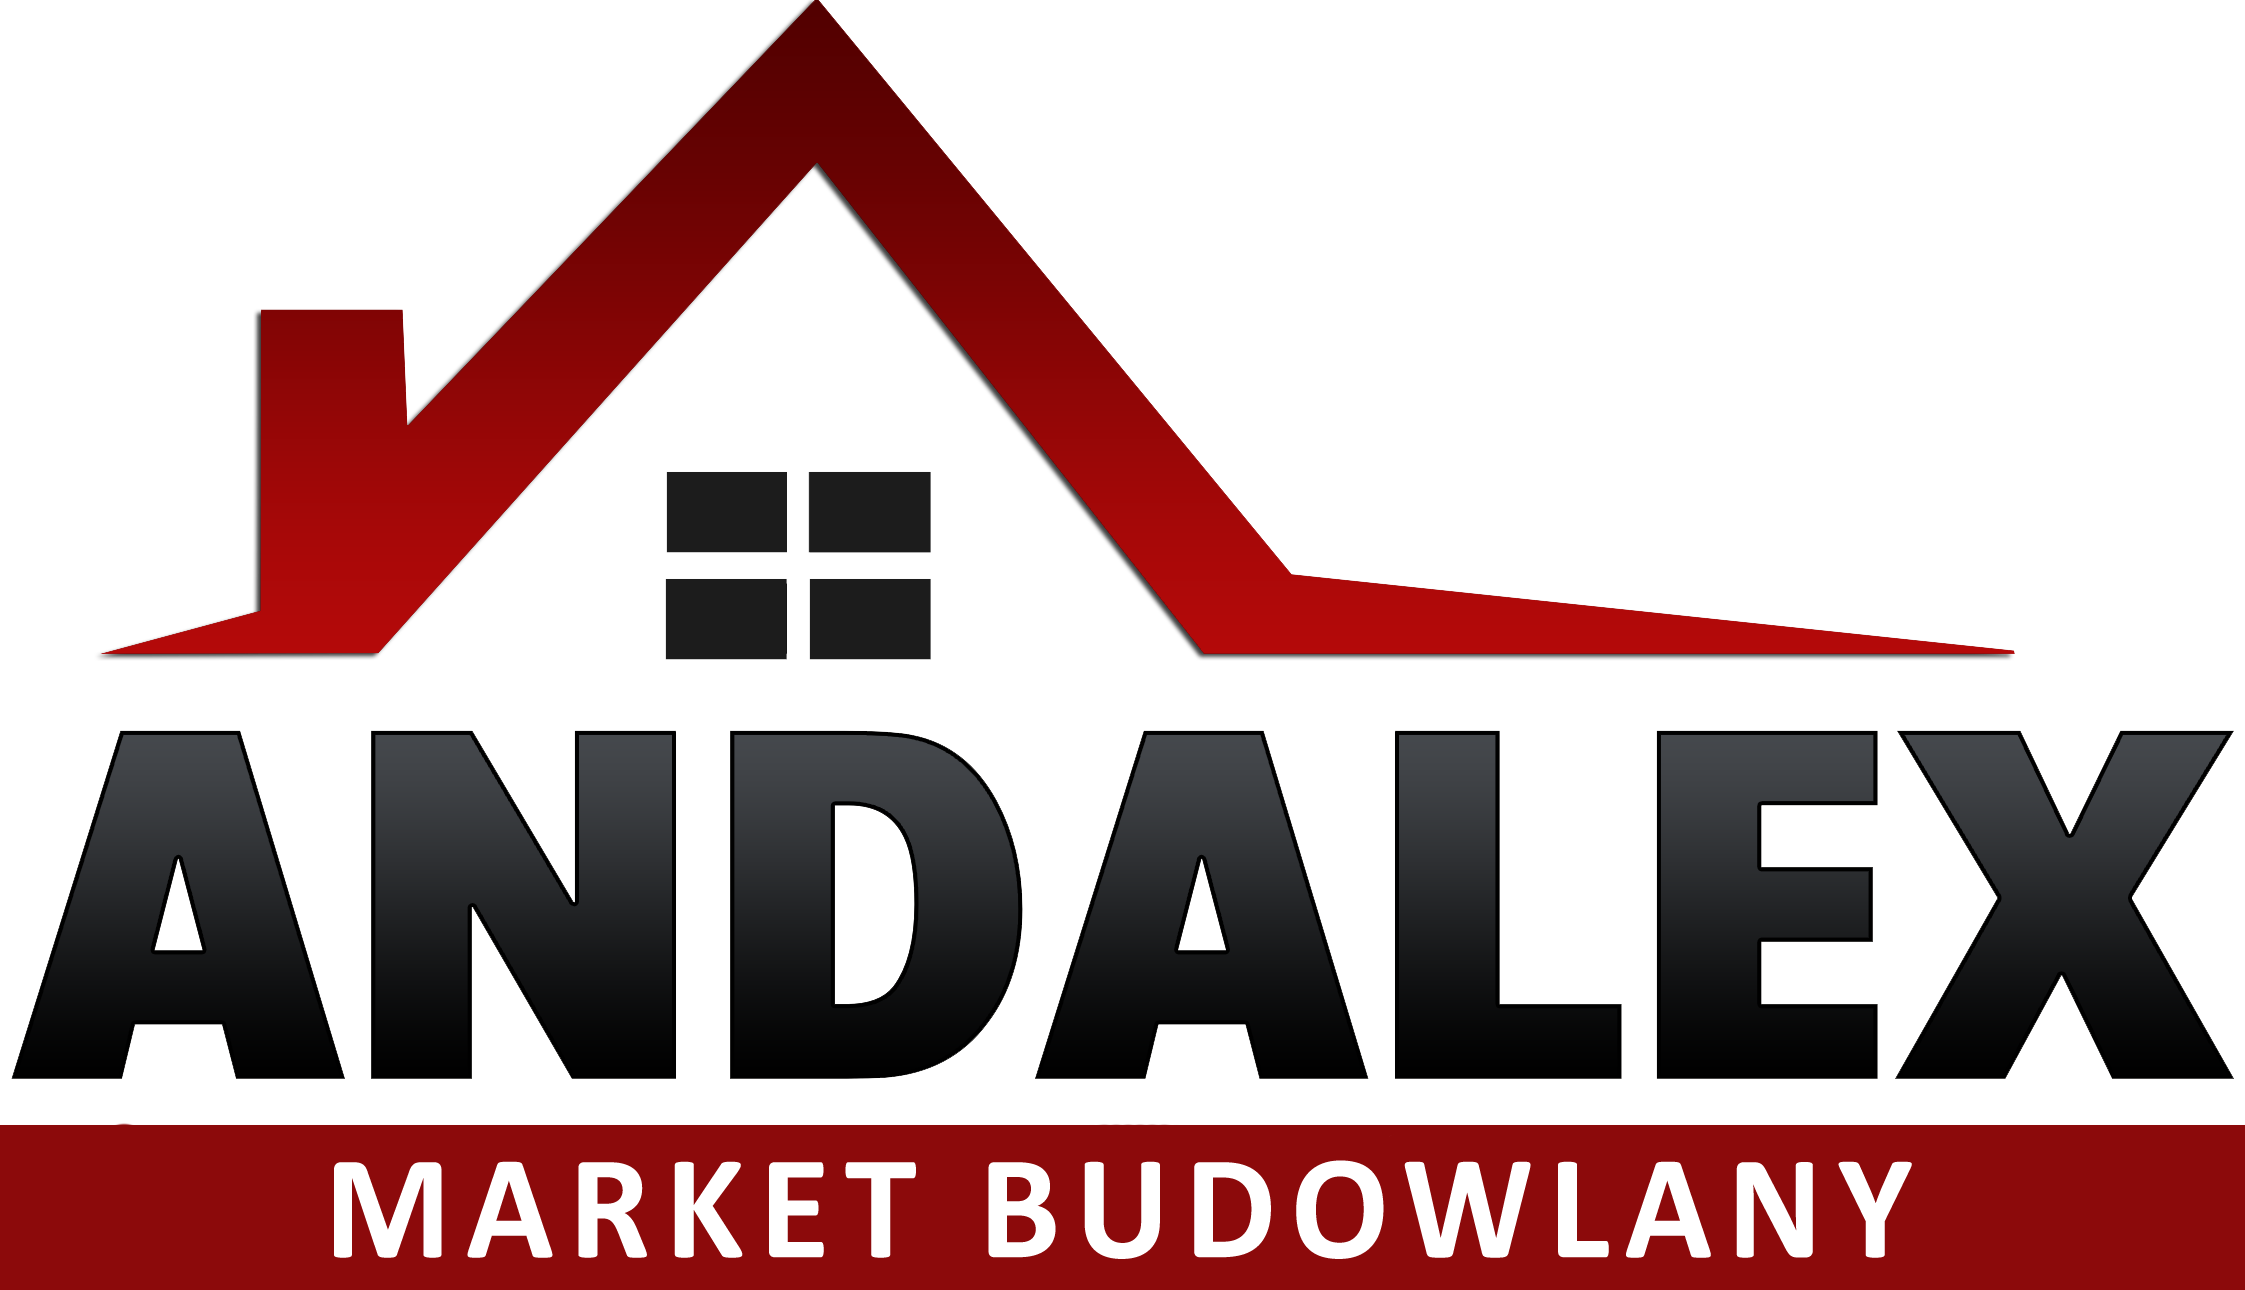 andalex-logo